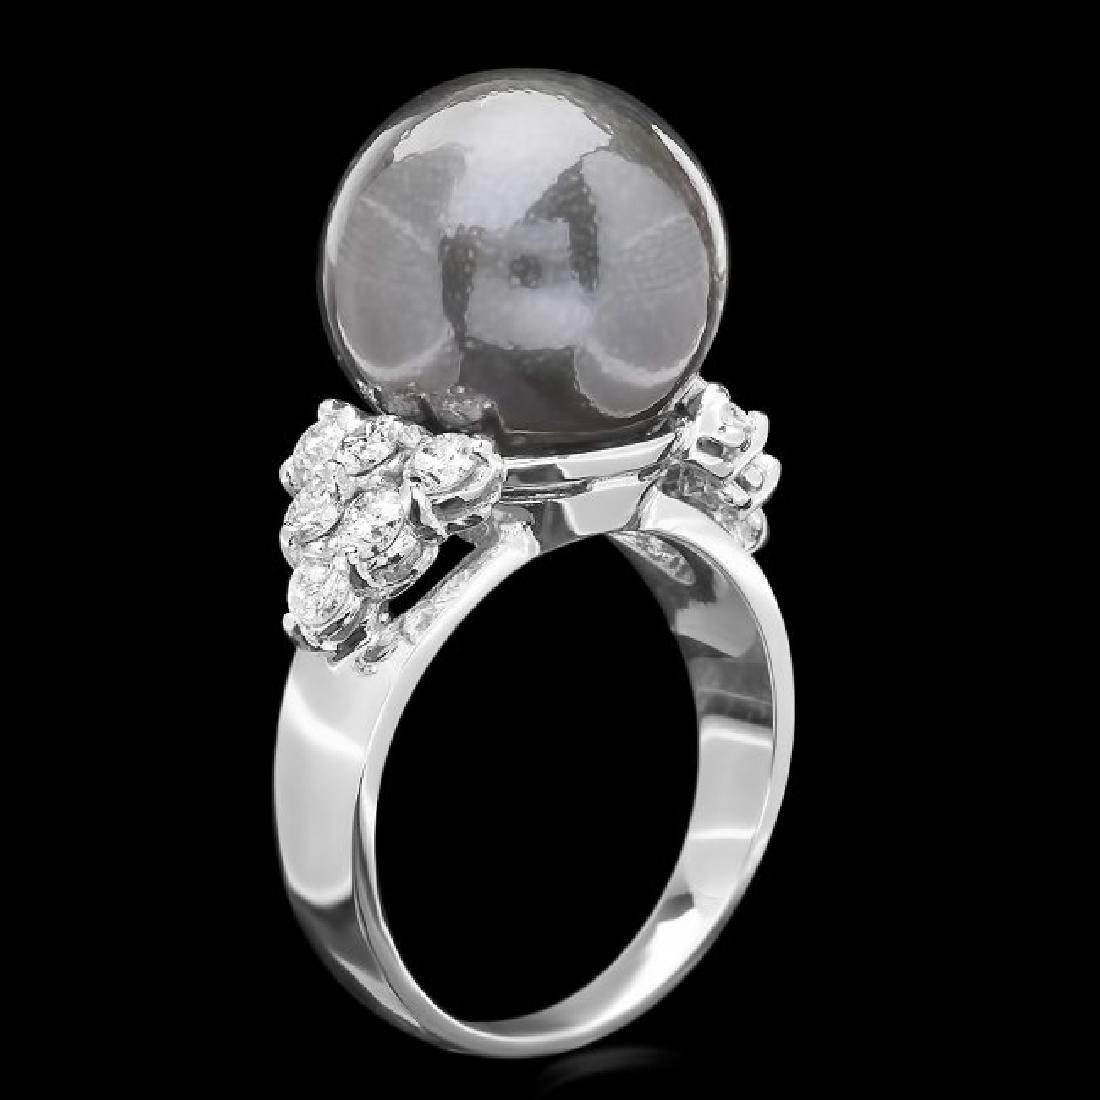 14k Gold 13 X 13mm Pearl 0.85ct Diamond Ring - 2